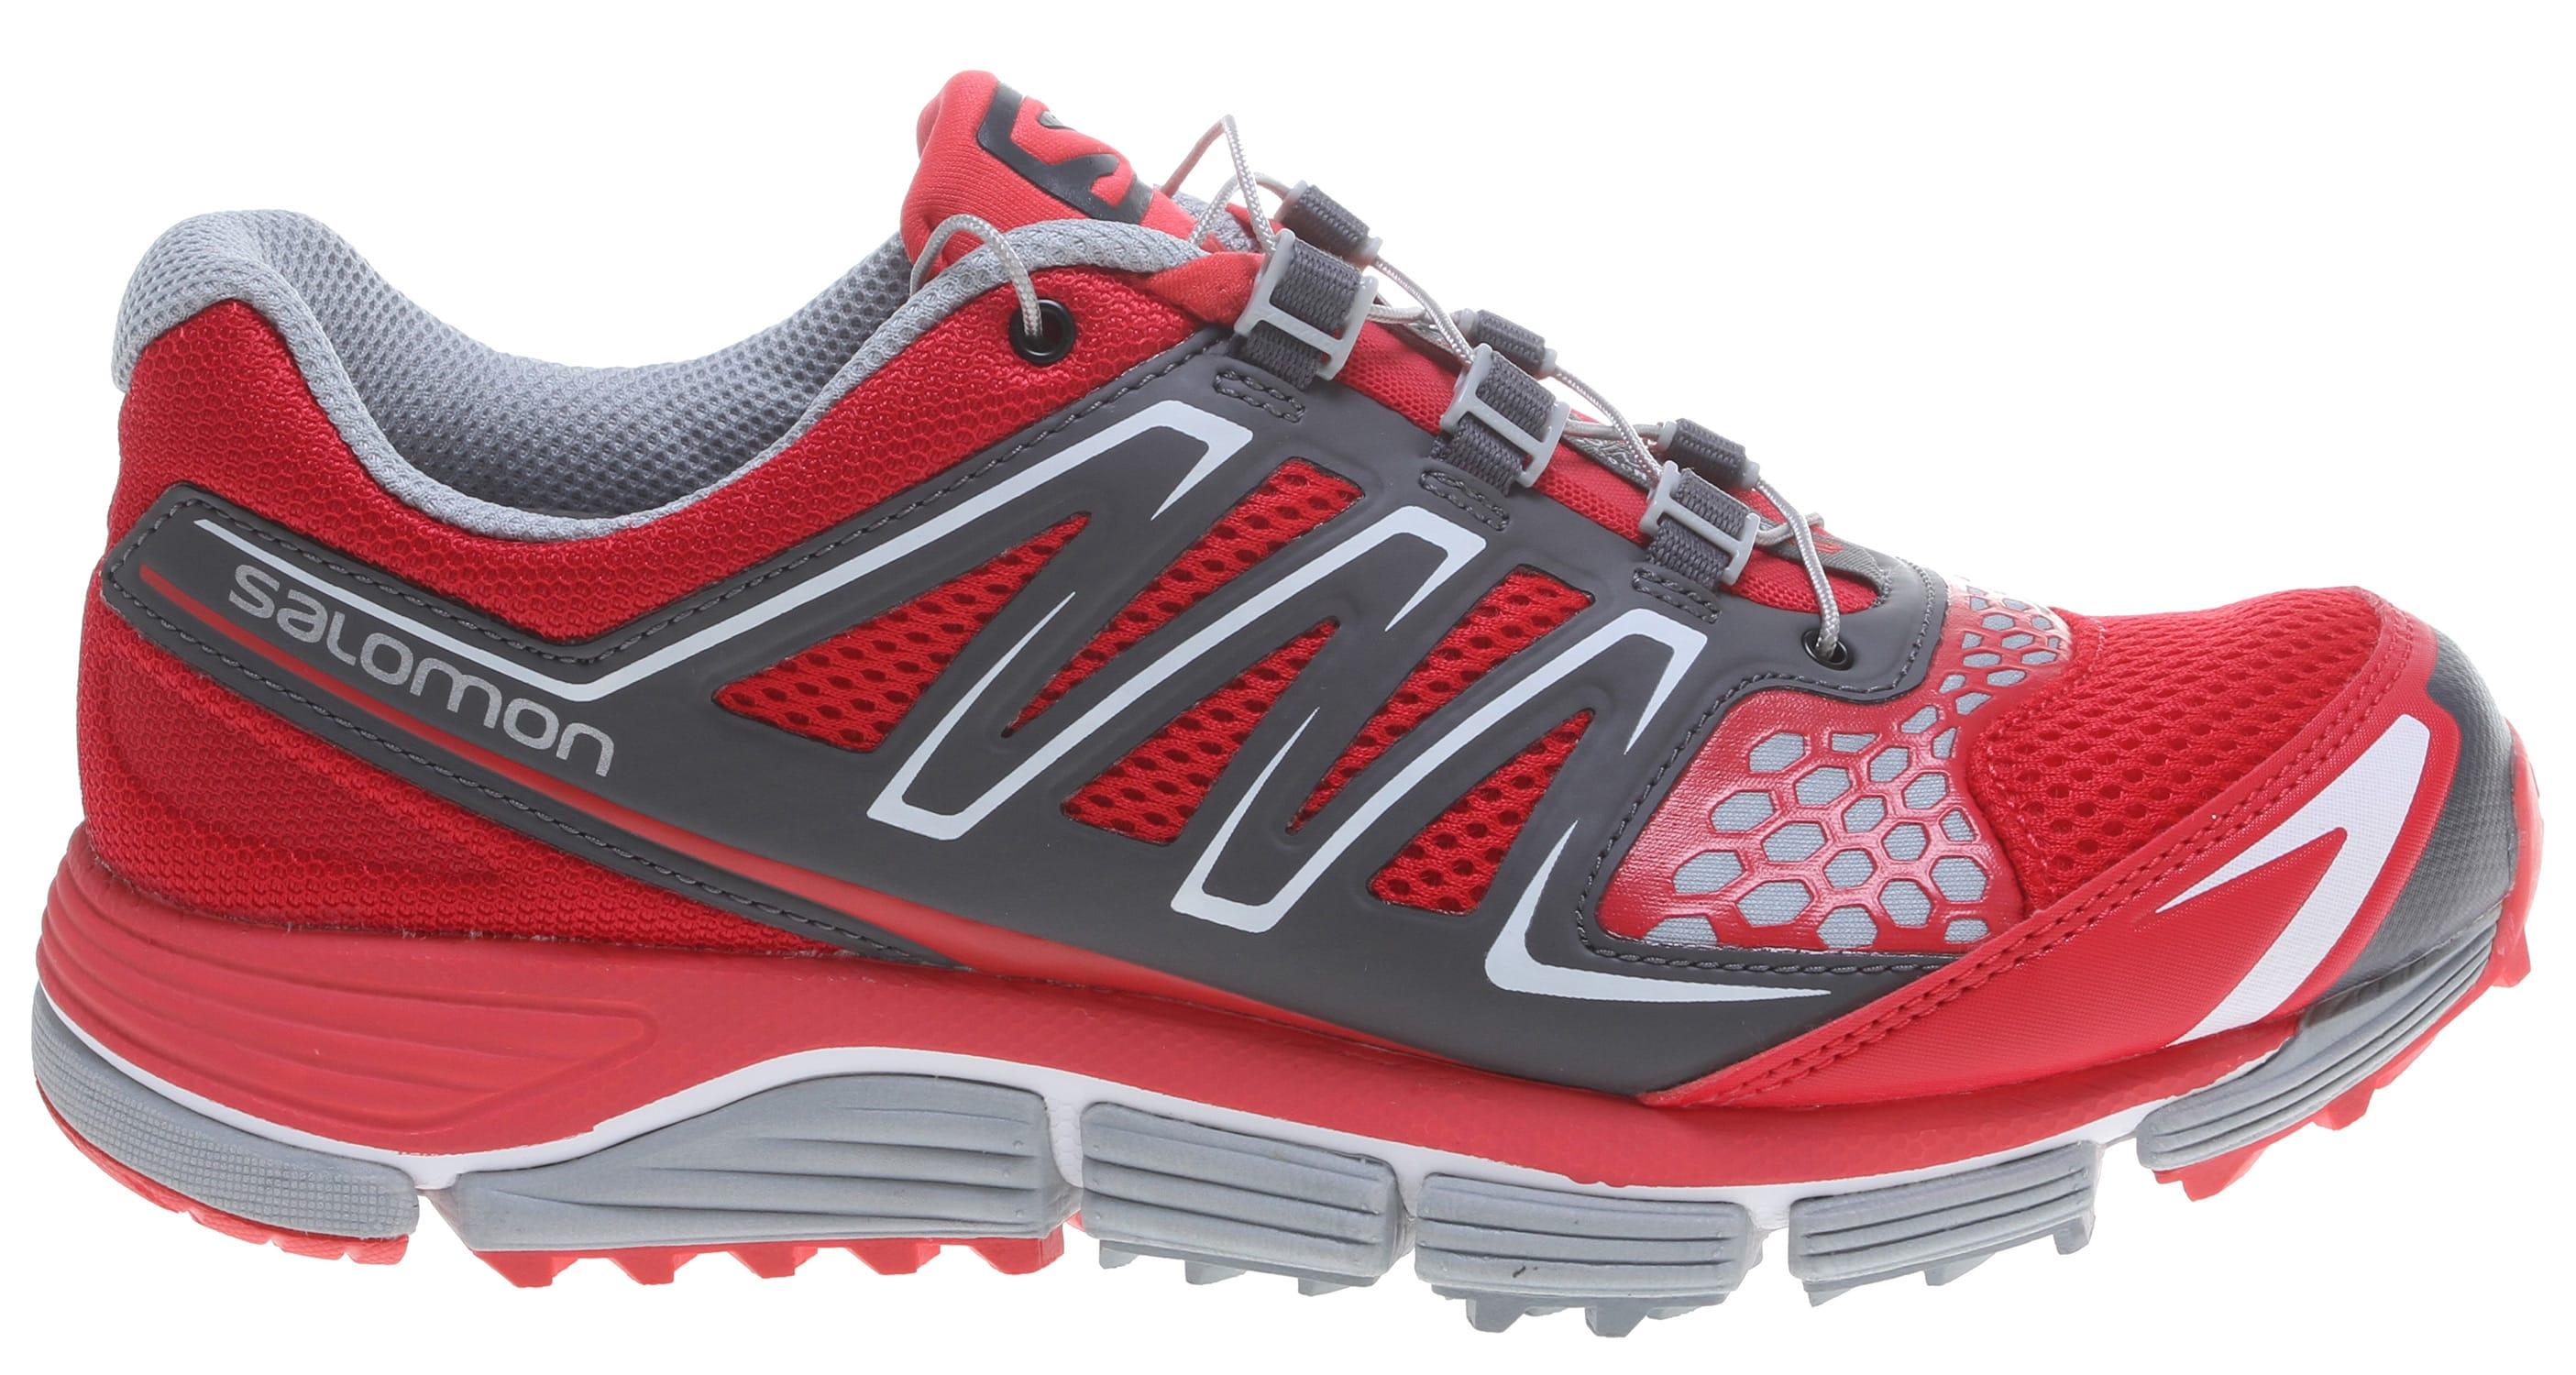 Details about Salomon XR Crossmax 2 Hiking Shoes Womens